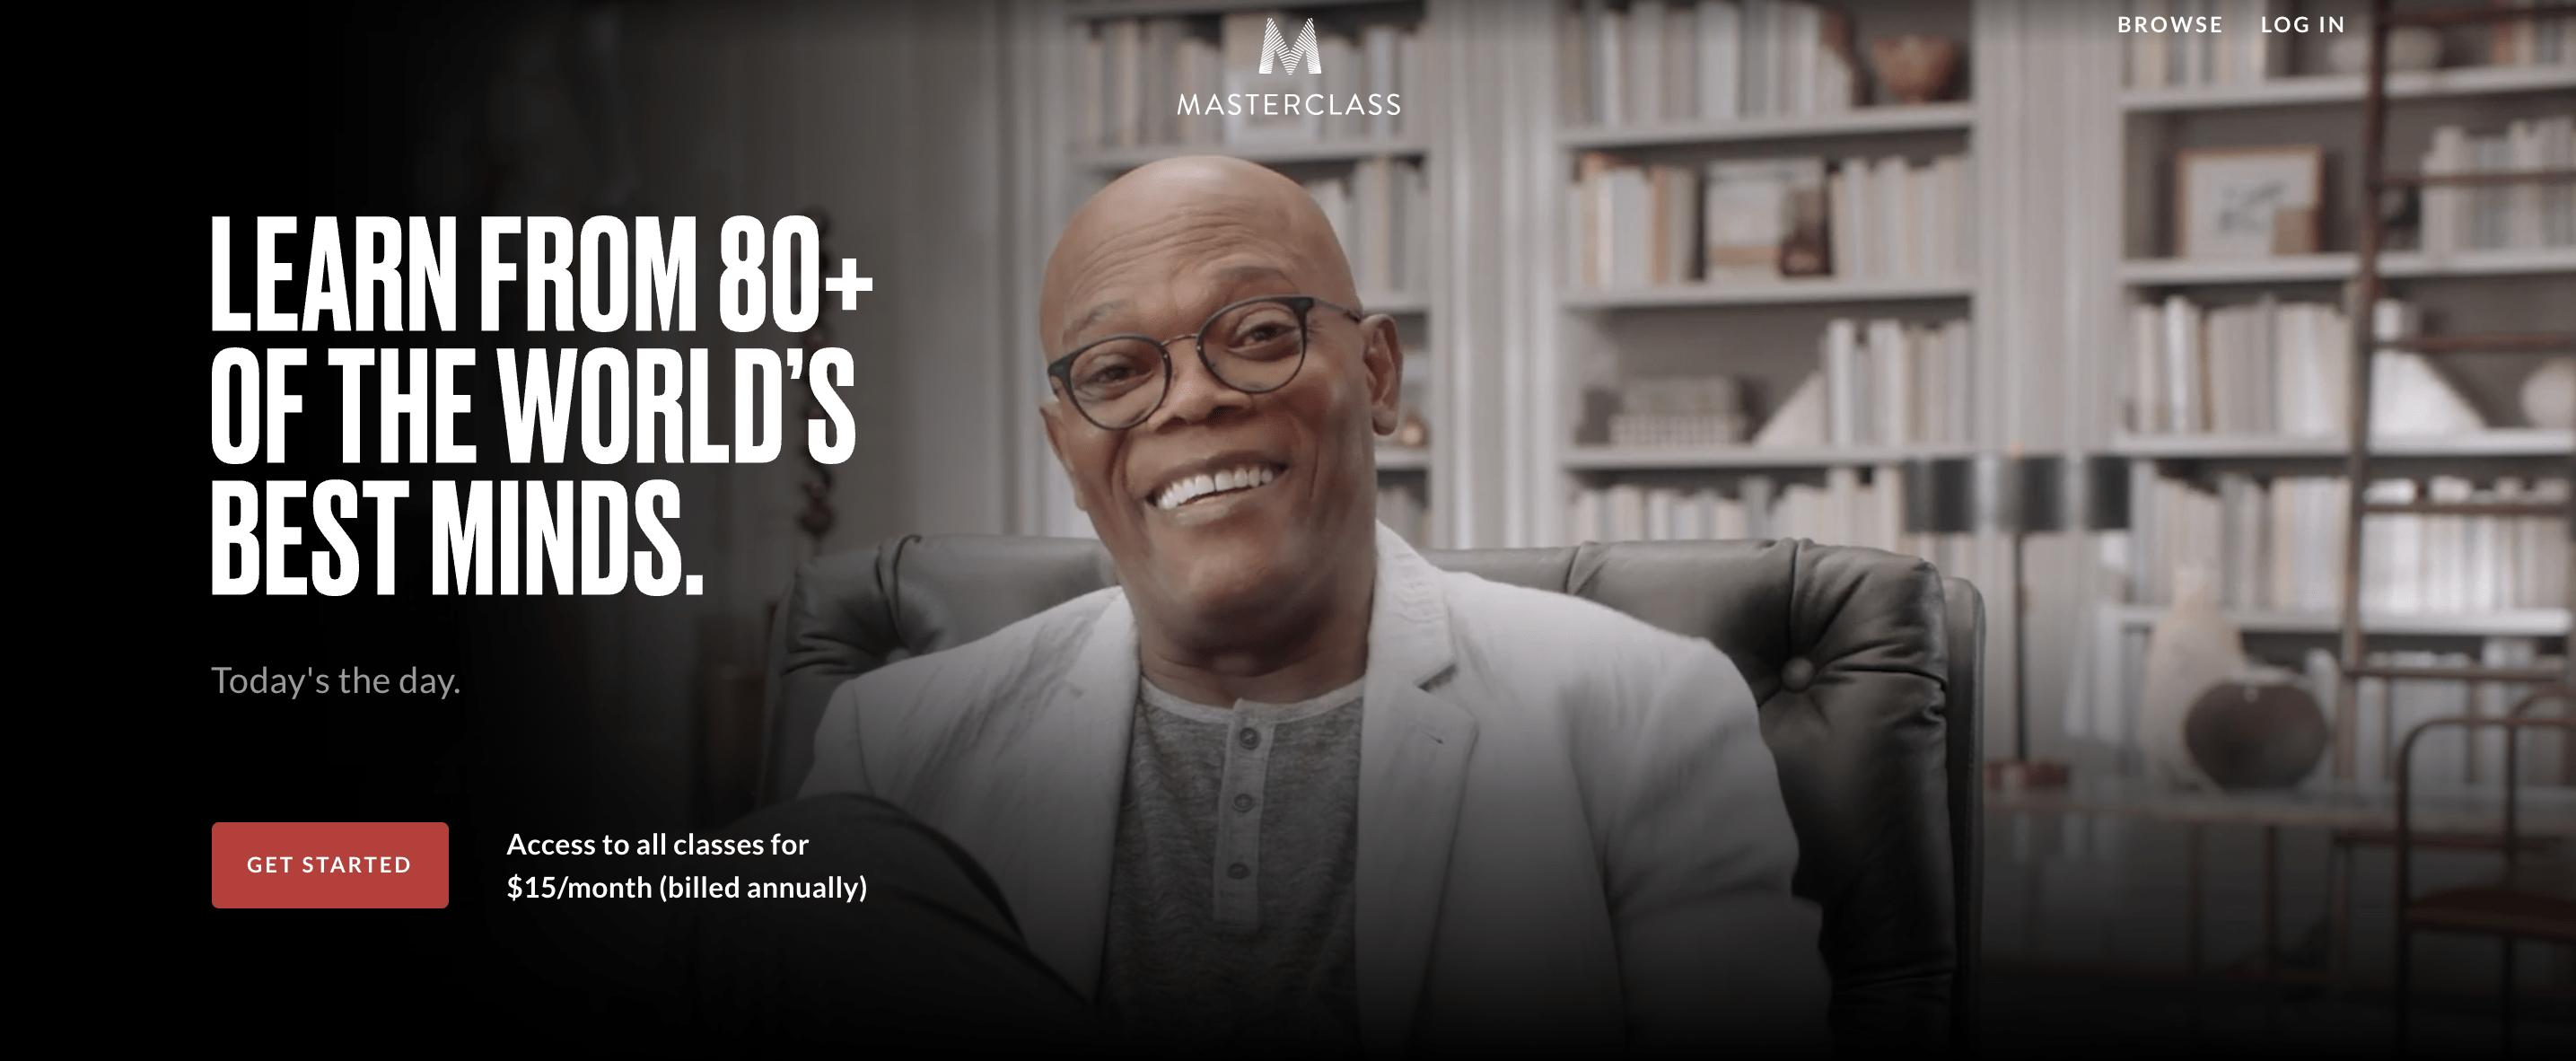 Masterclass ad with Samuel L. Jackson